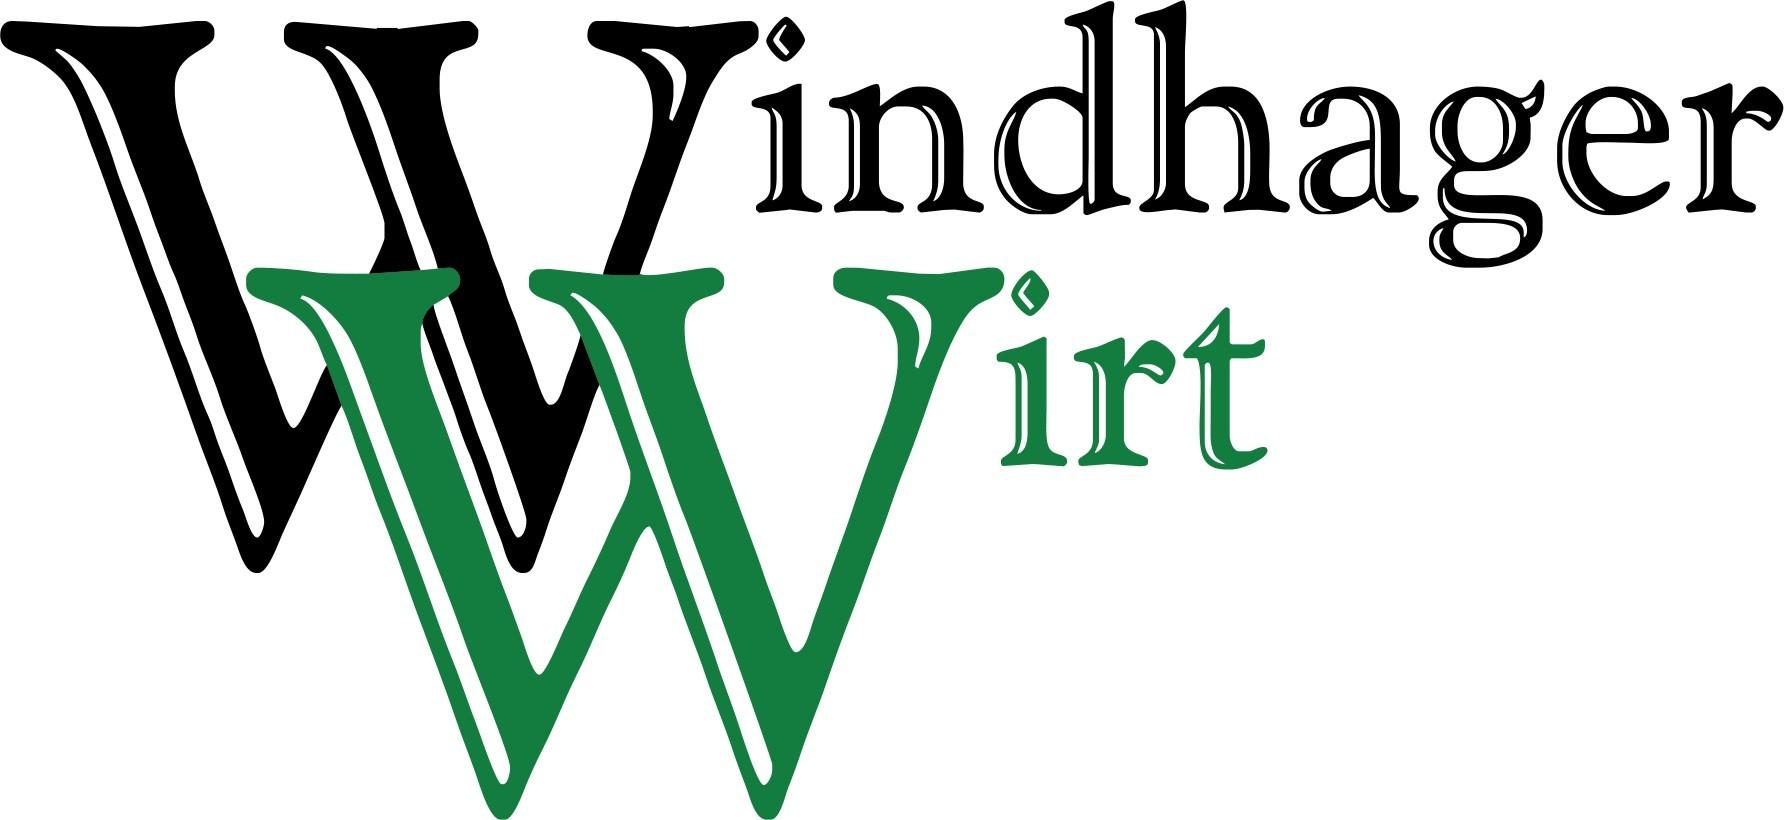 Logo Windhager Wirt.jpg